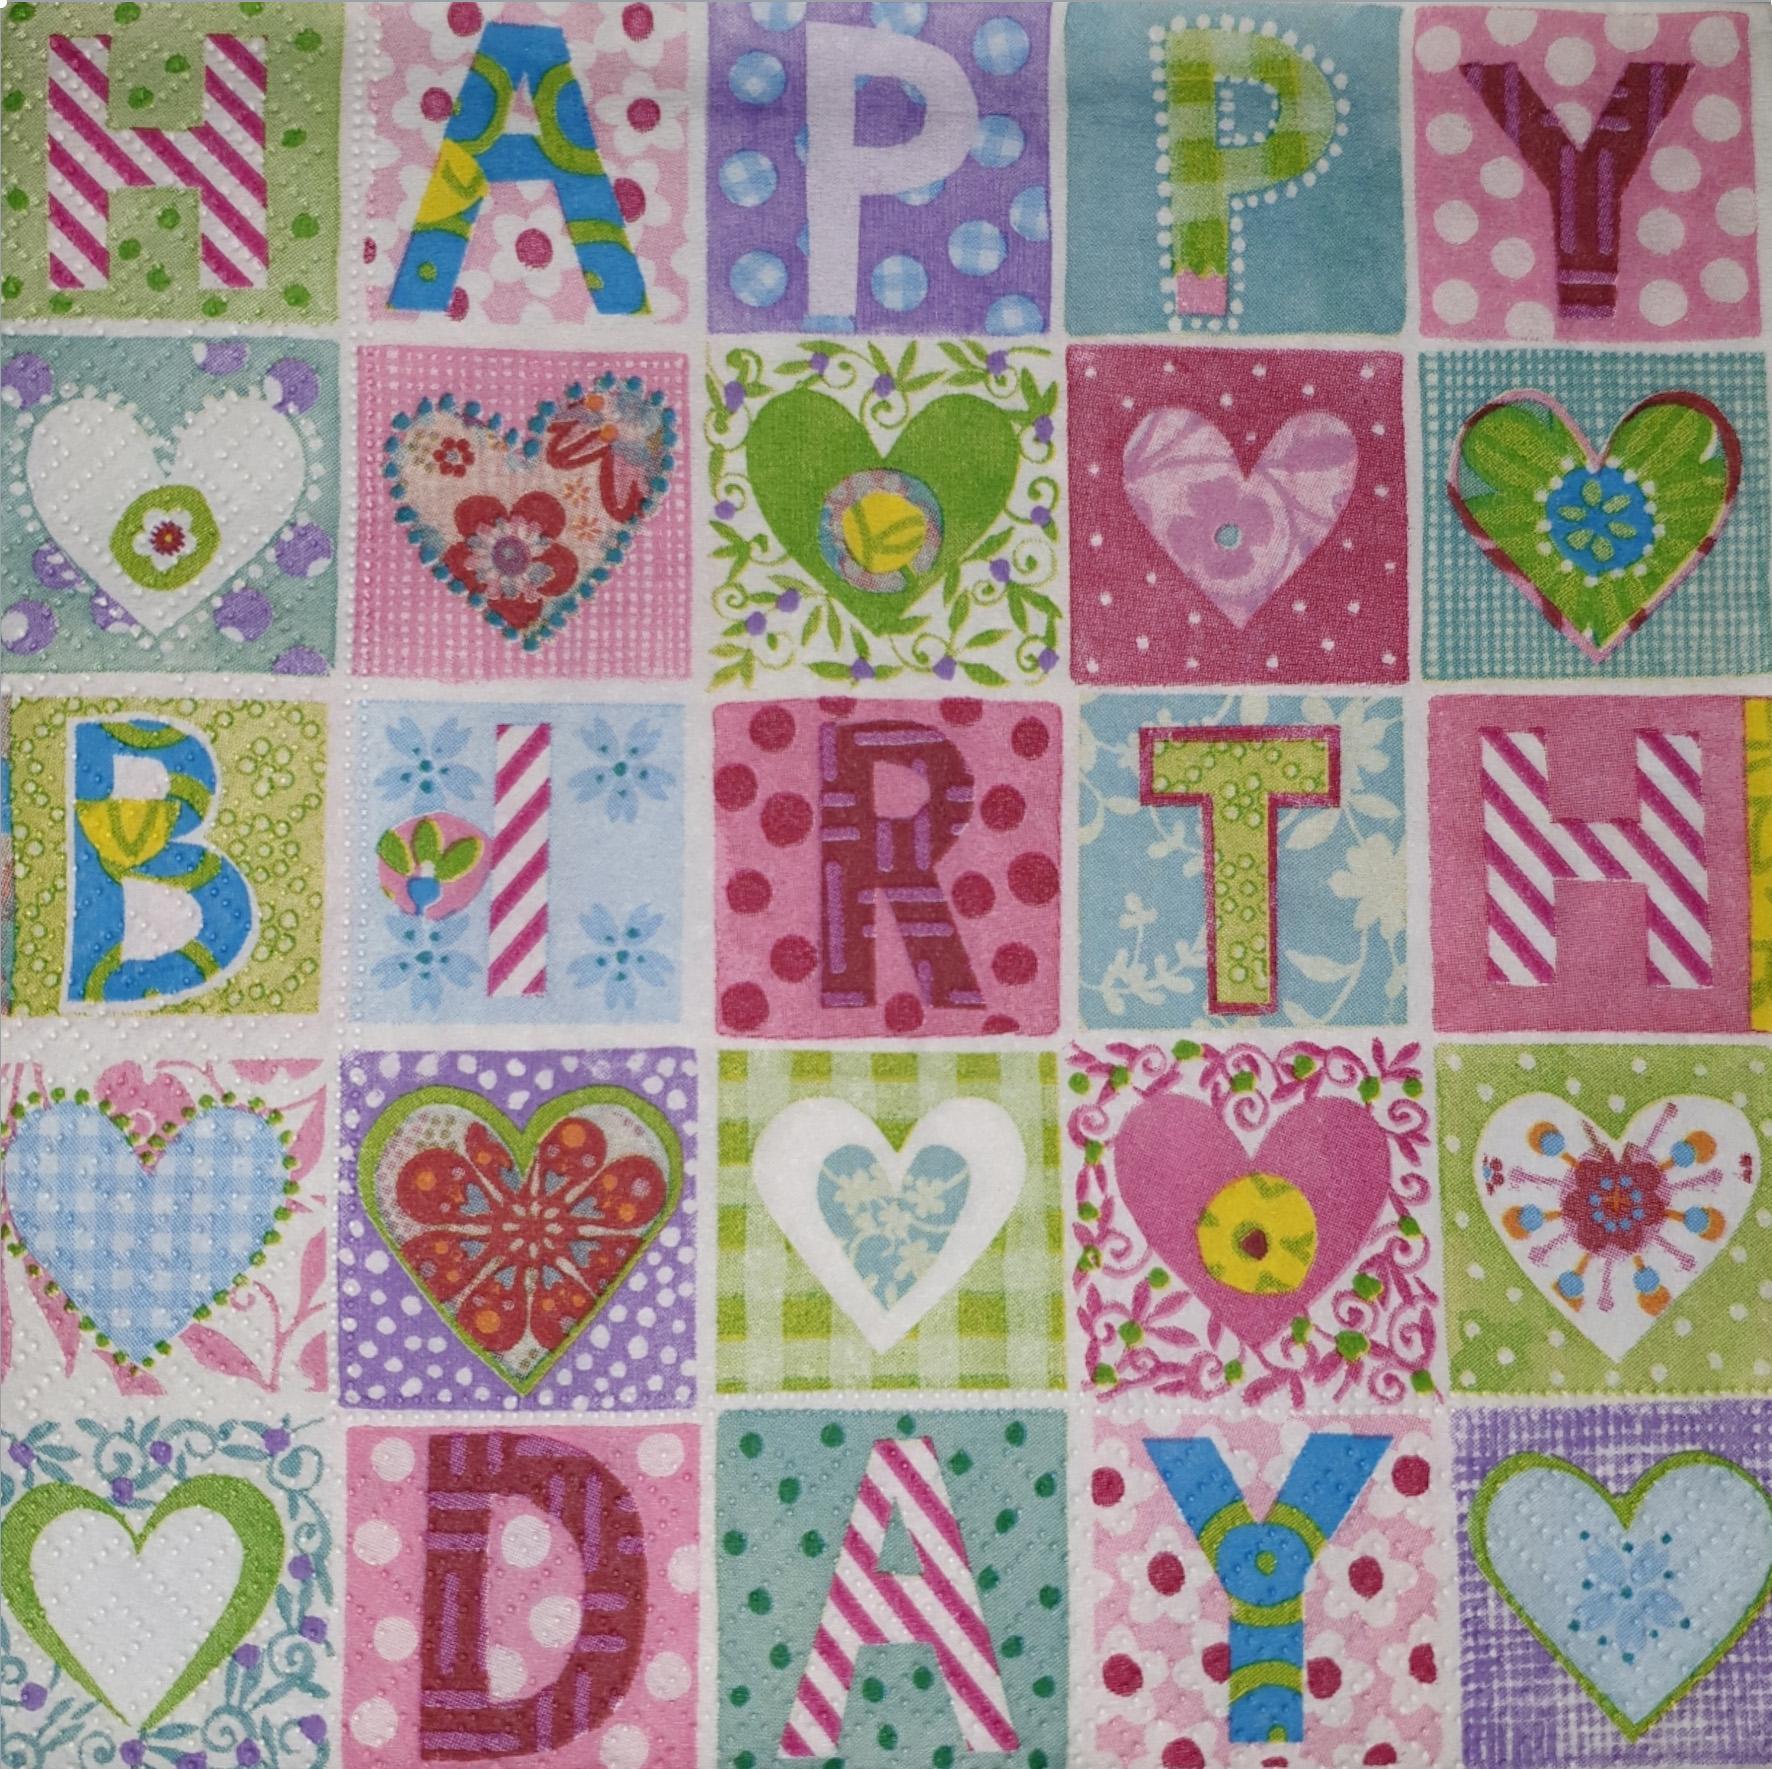 SERVILLETA HAPPY BIRTHDAY